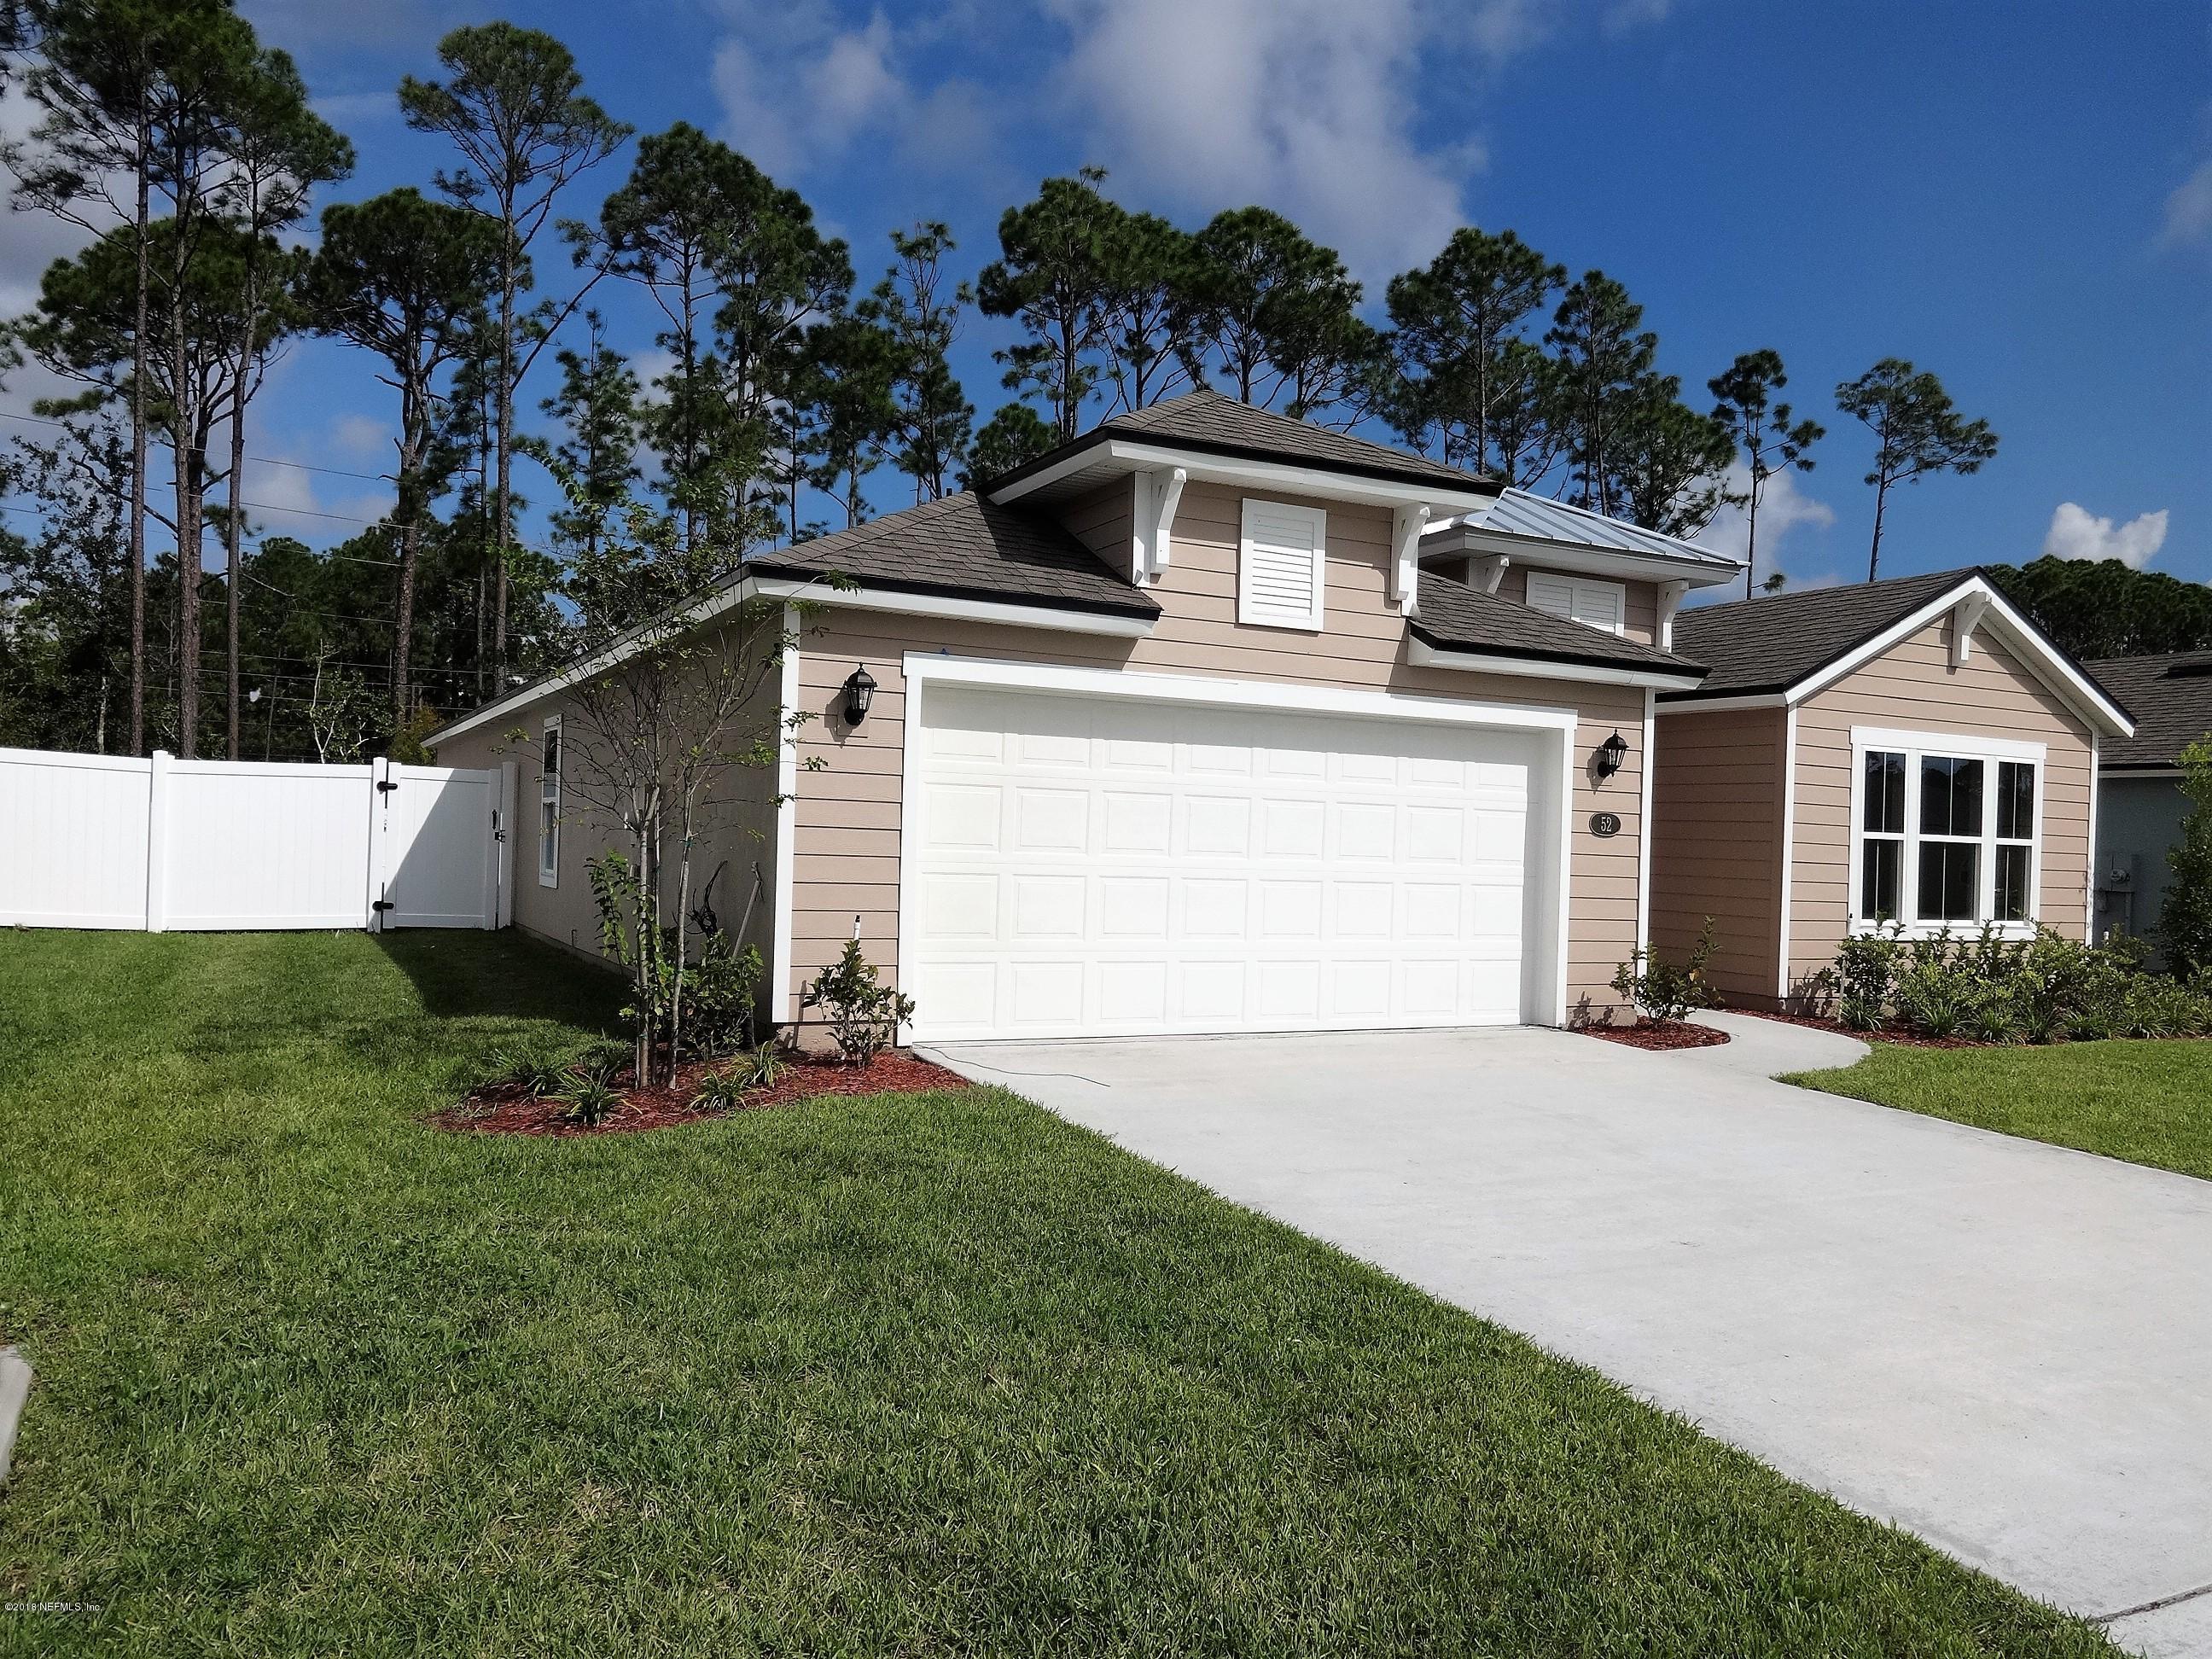 52 COASTAL HAMMOCK, ST AUGUSTINE, FLORIDA 32086, 4 Bedrooms Bedrooms, ,2 BathroomsBathrooms,Residential - single family,For sale,COASTAL HAMMOCK,923022